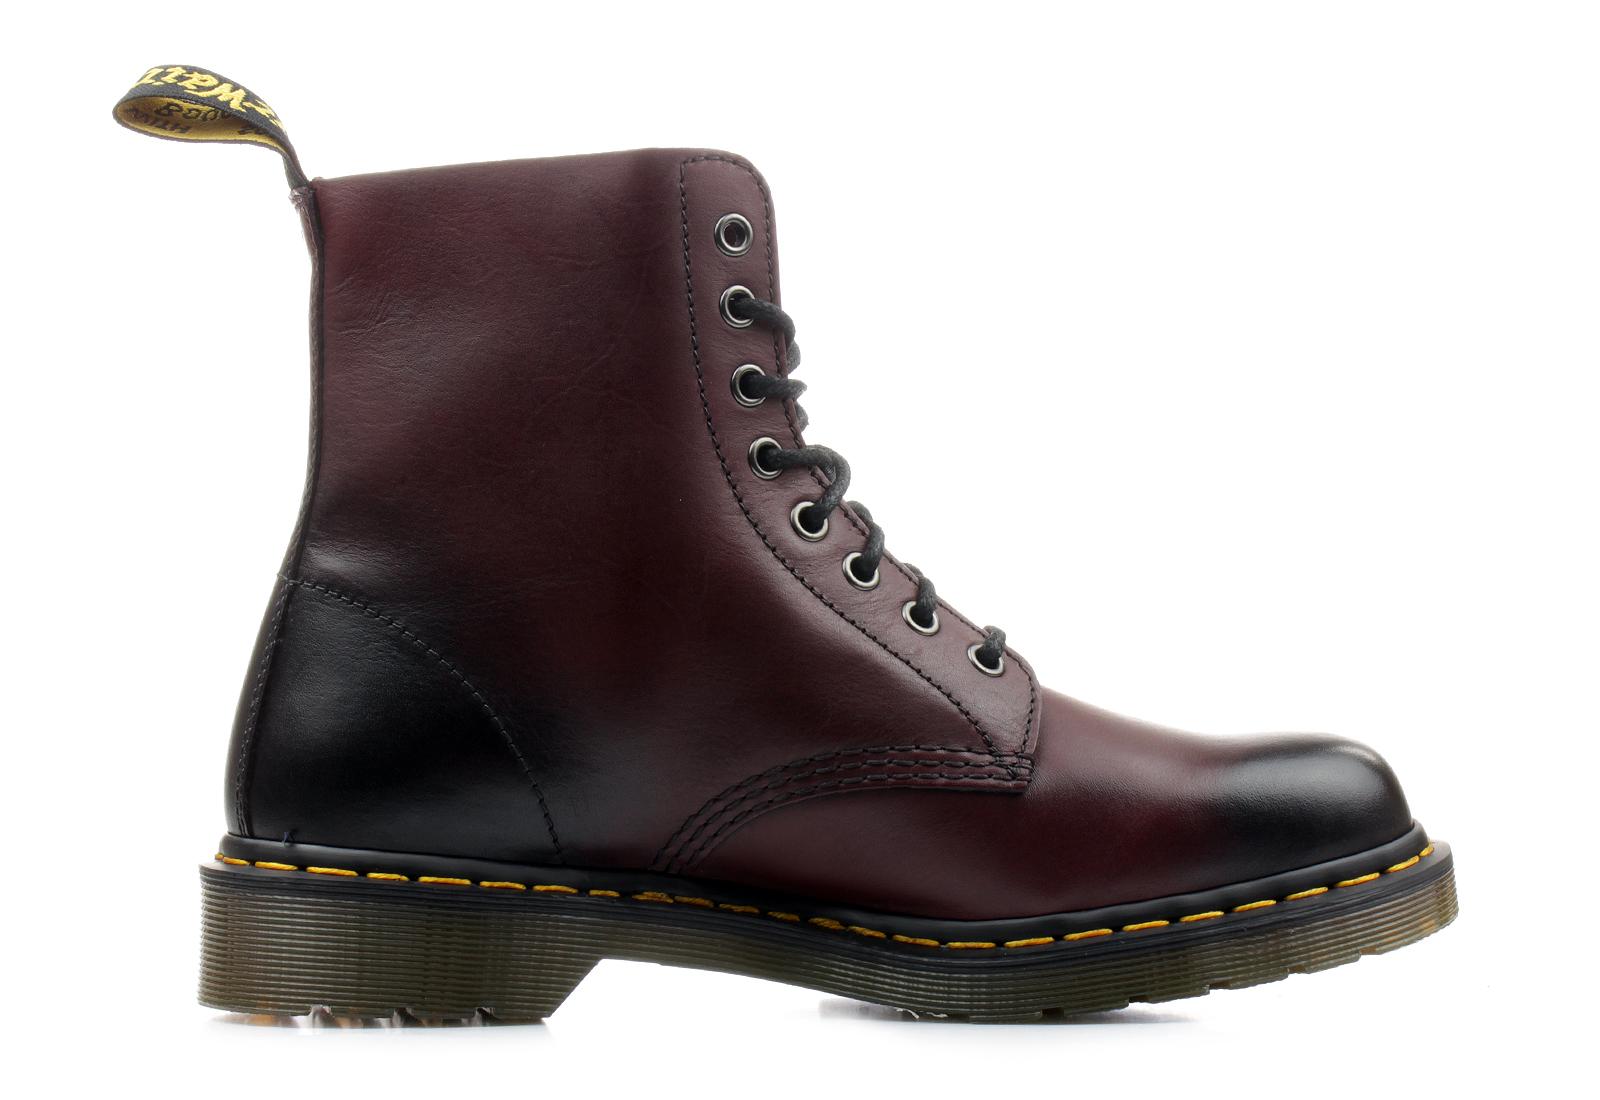 Dr Martens Boty Farmářky - Pascal - 8 Eye Boot - DM21154600Tenisky ... de72cc7ec1